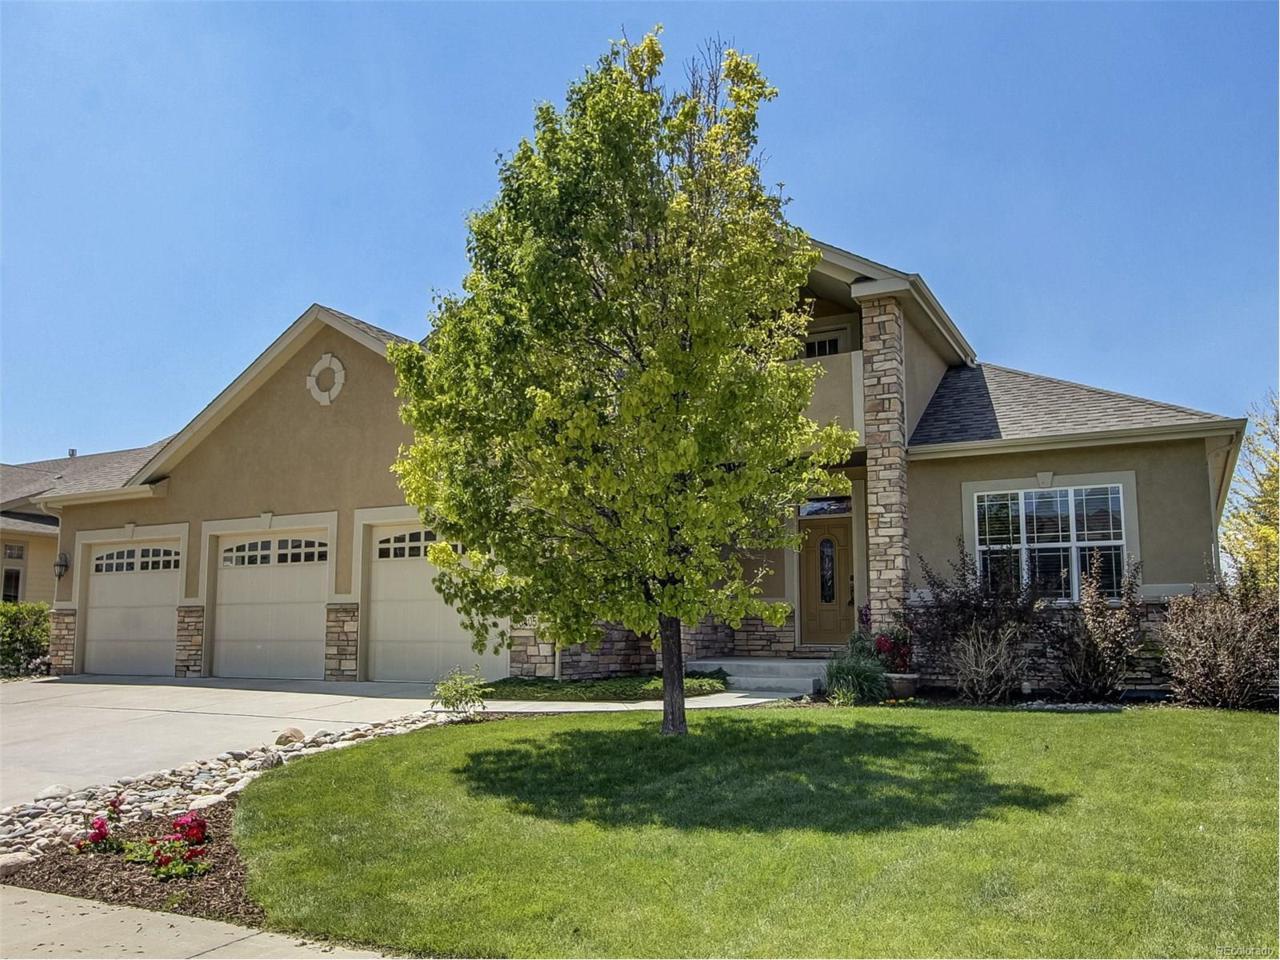 8405 Spinnaker Bay Drive, Windsor, CO 80528 (MLS #4284579) :: 8z Real Estate